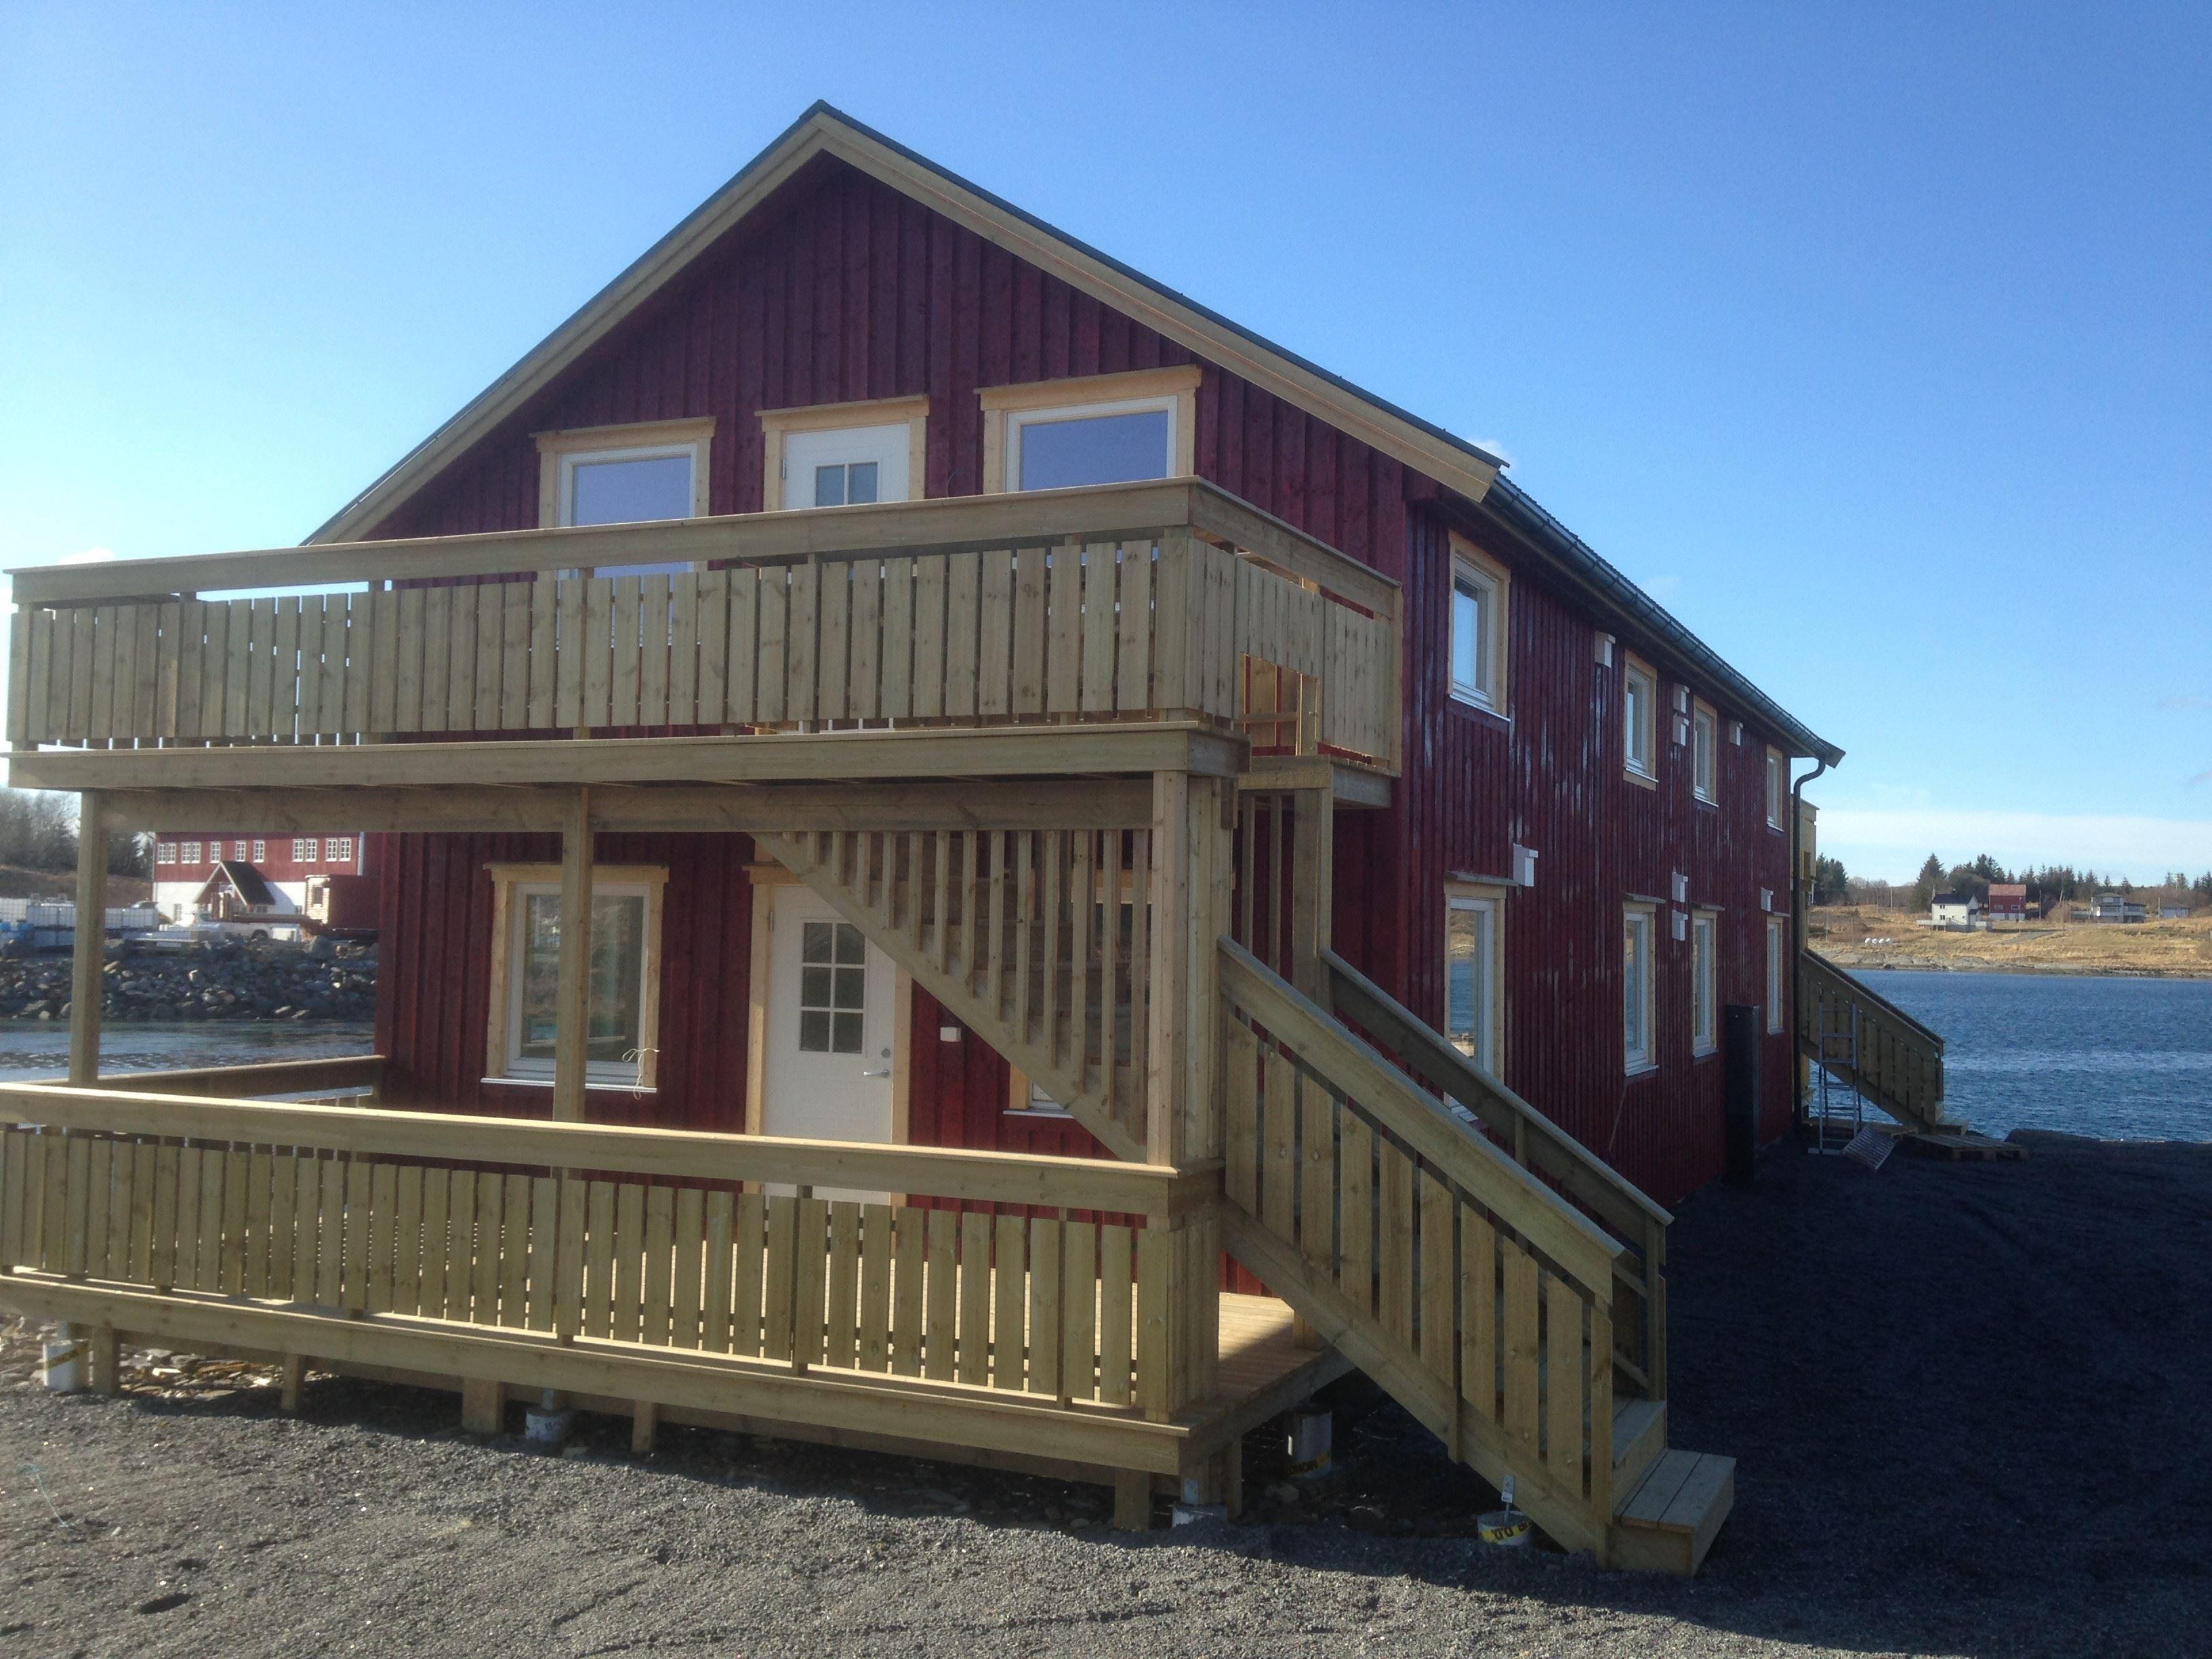 Dønna Rorbuer Bøteriet - fisherman hut's